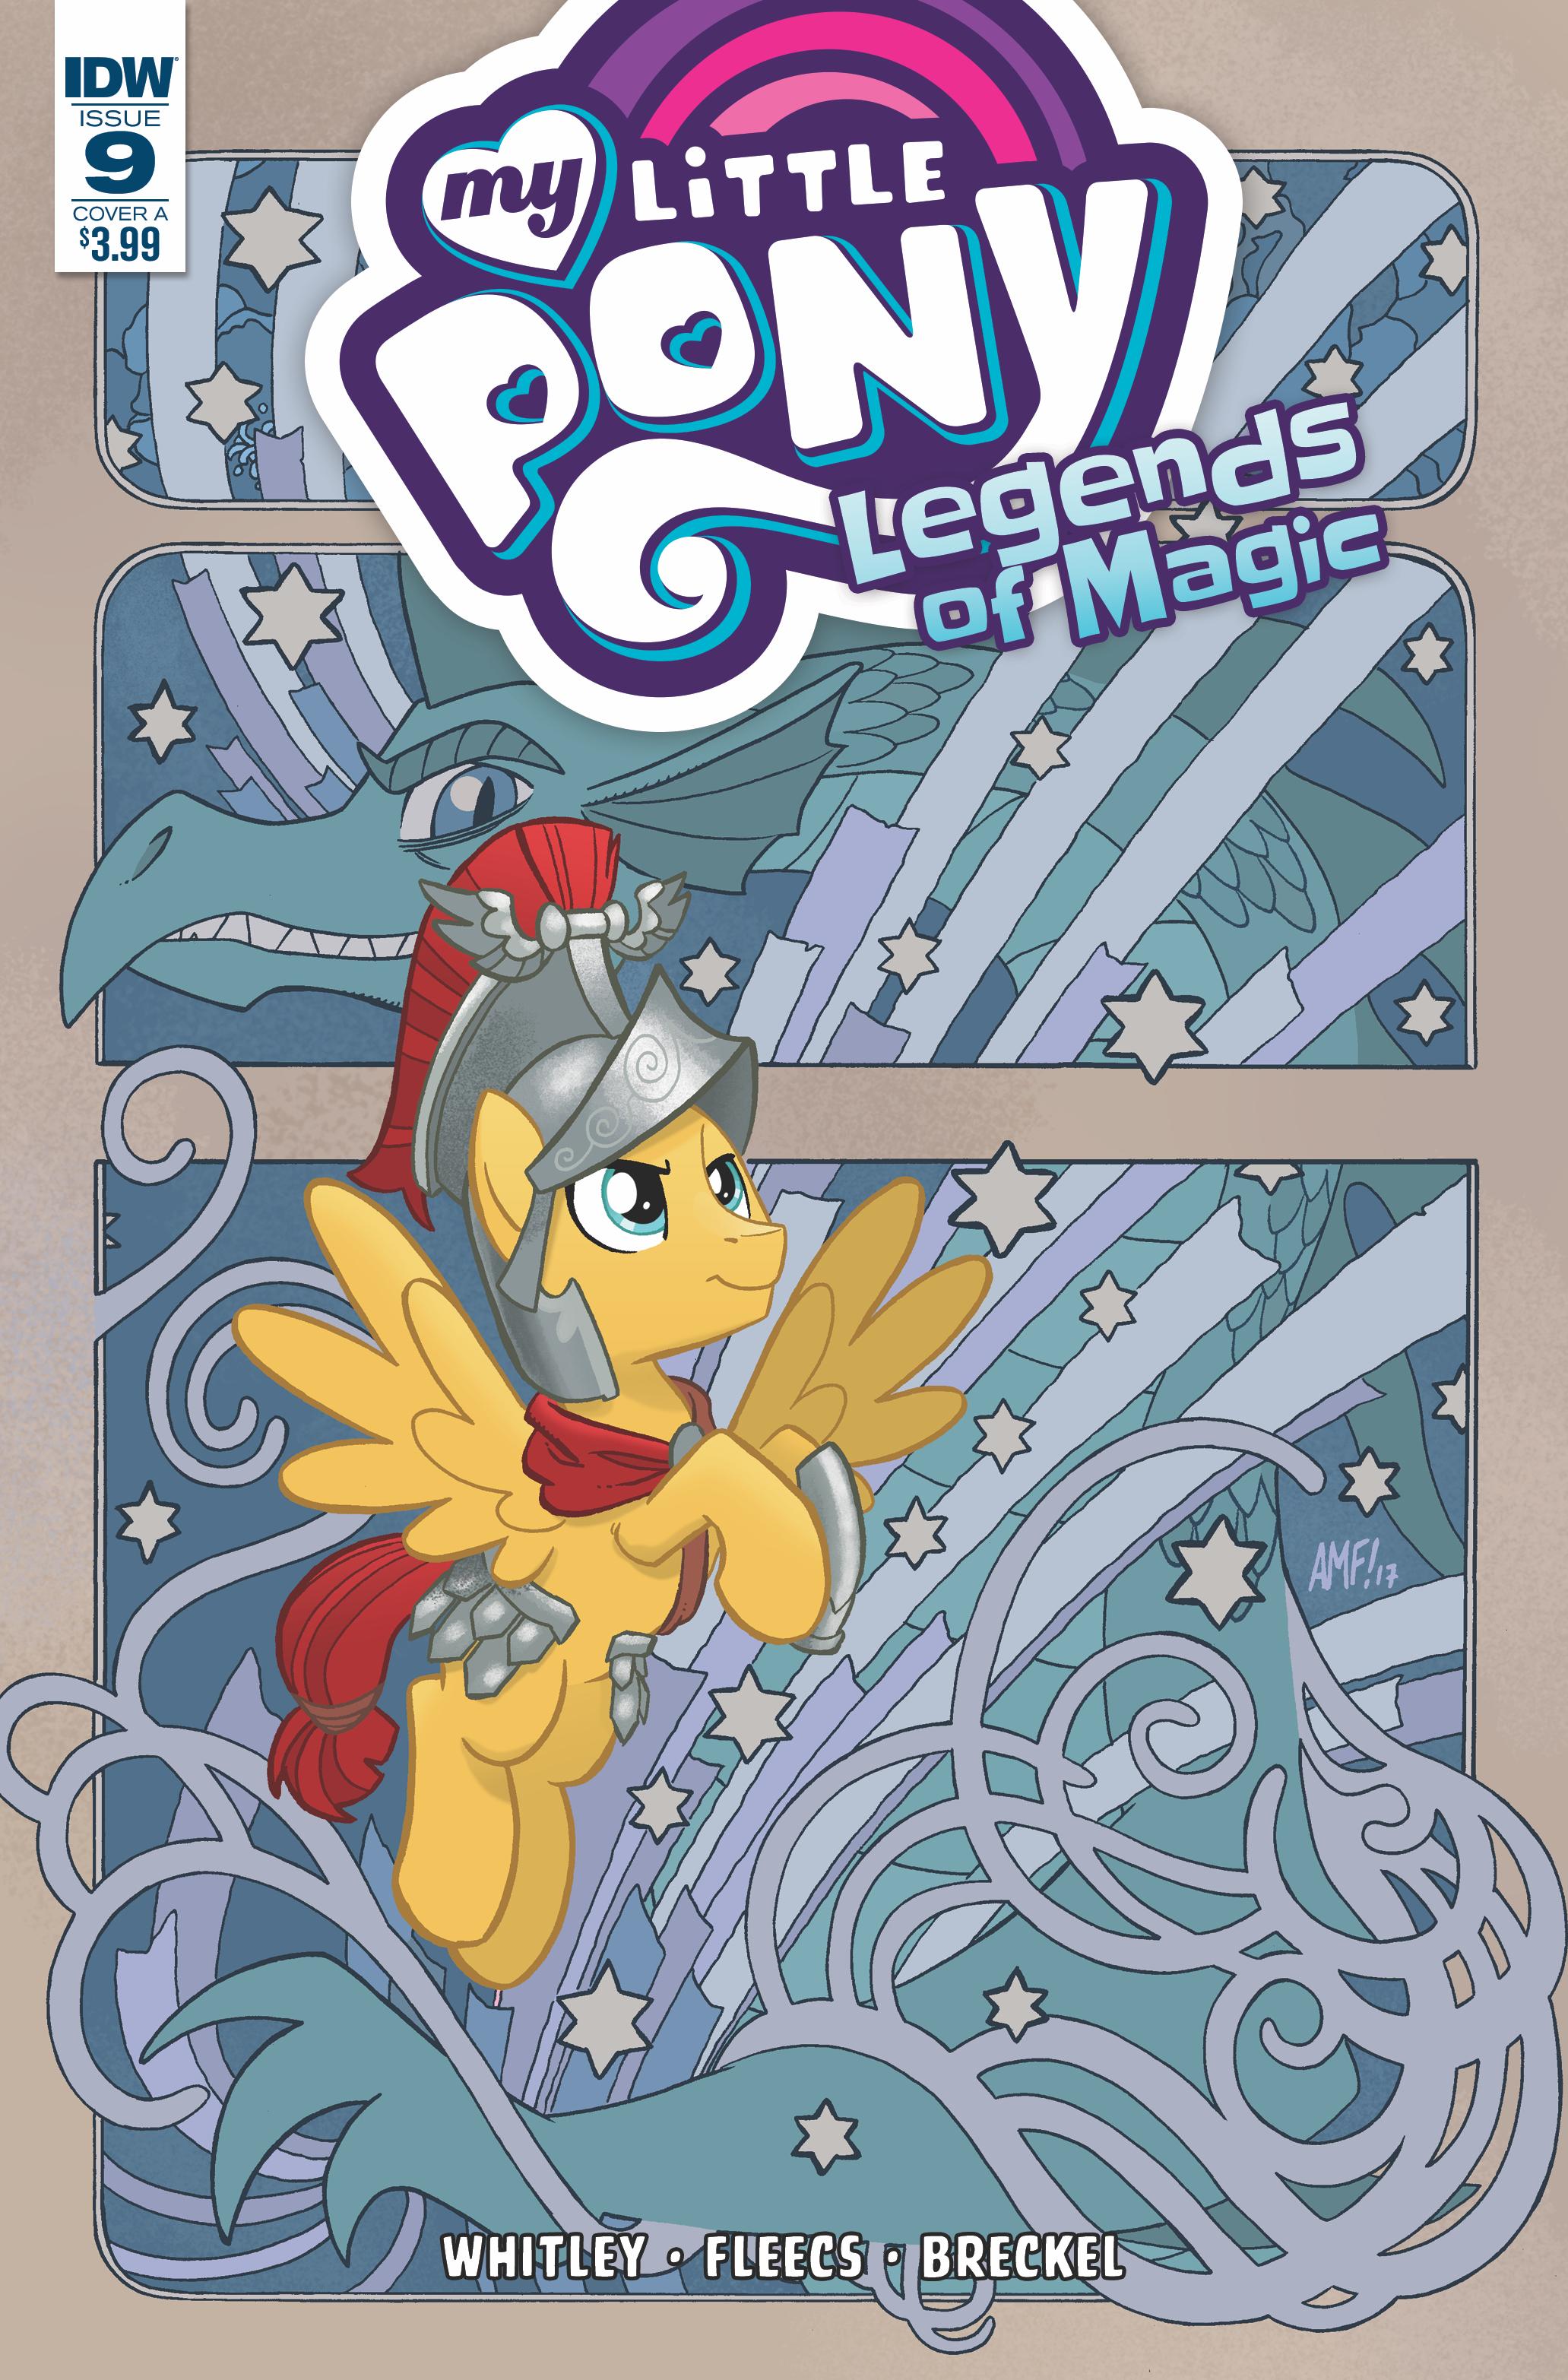 Legends of Magic Issue 9